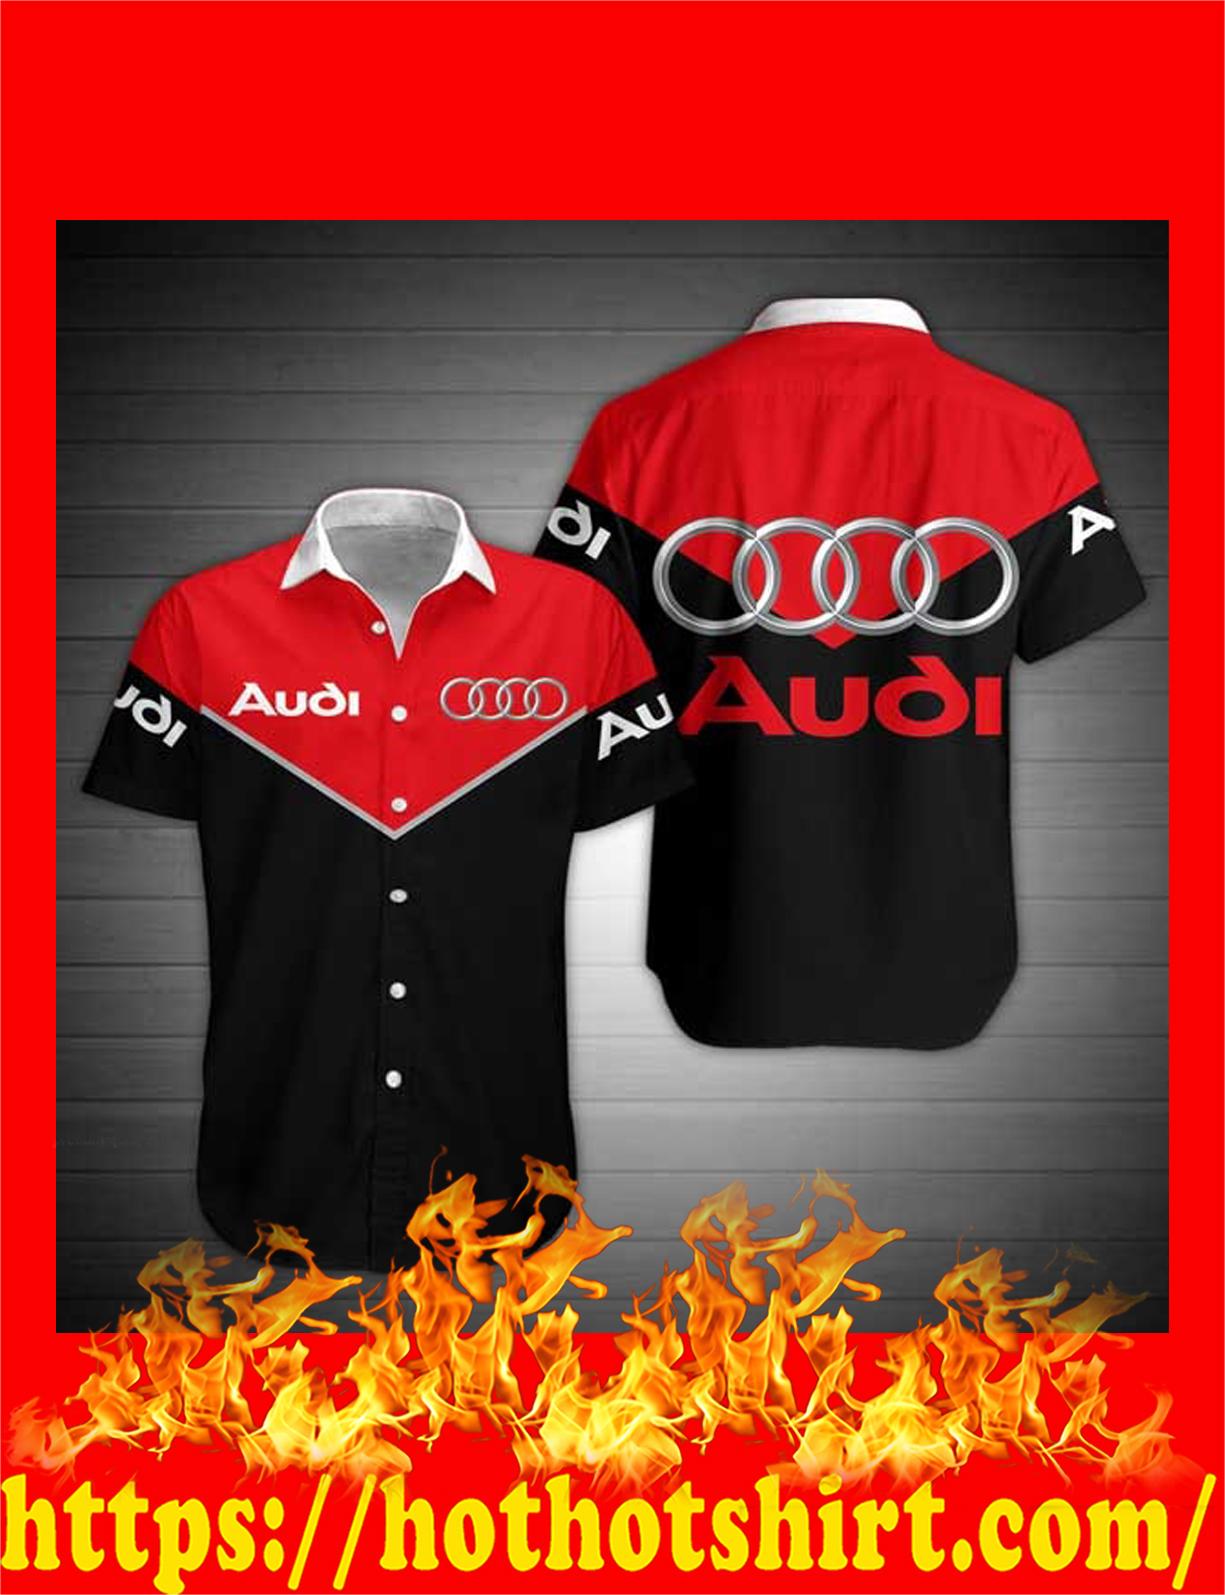 Audi hawaiian shirt - detail